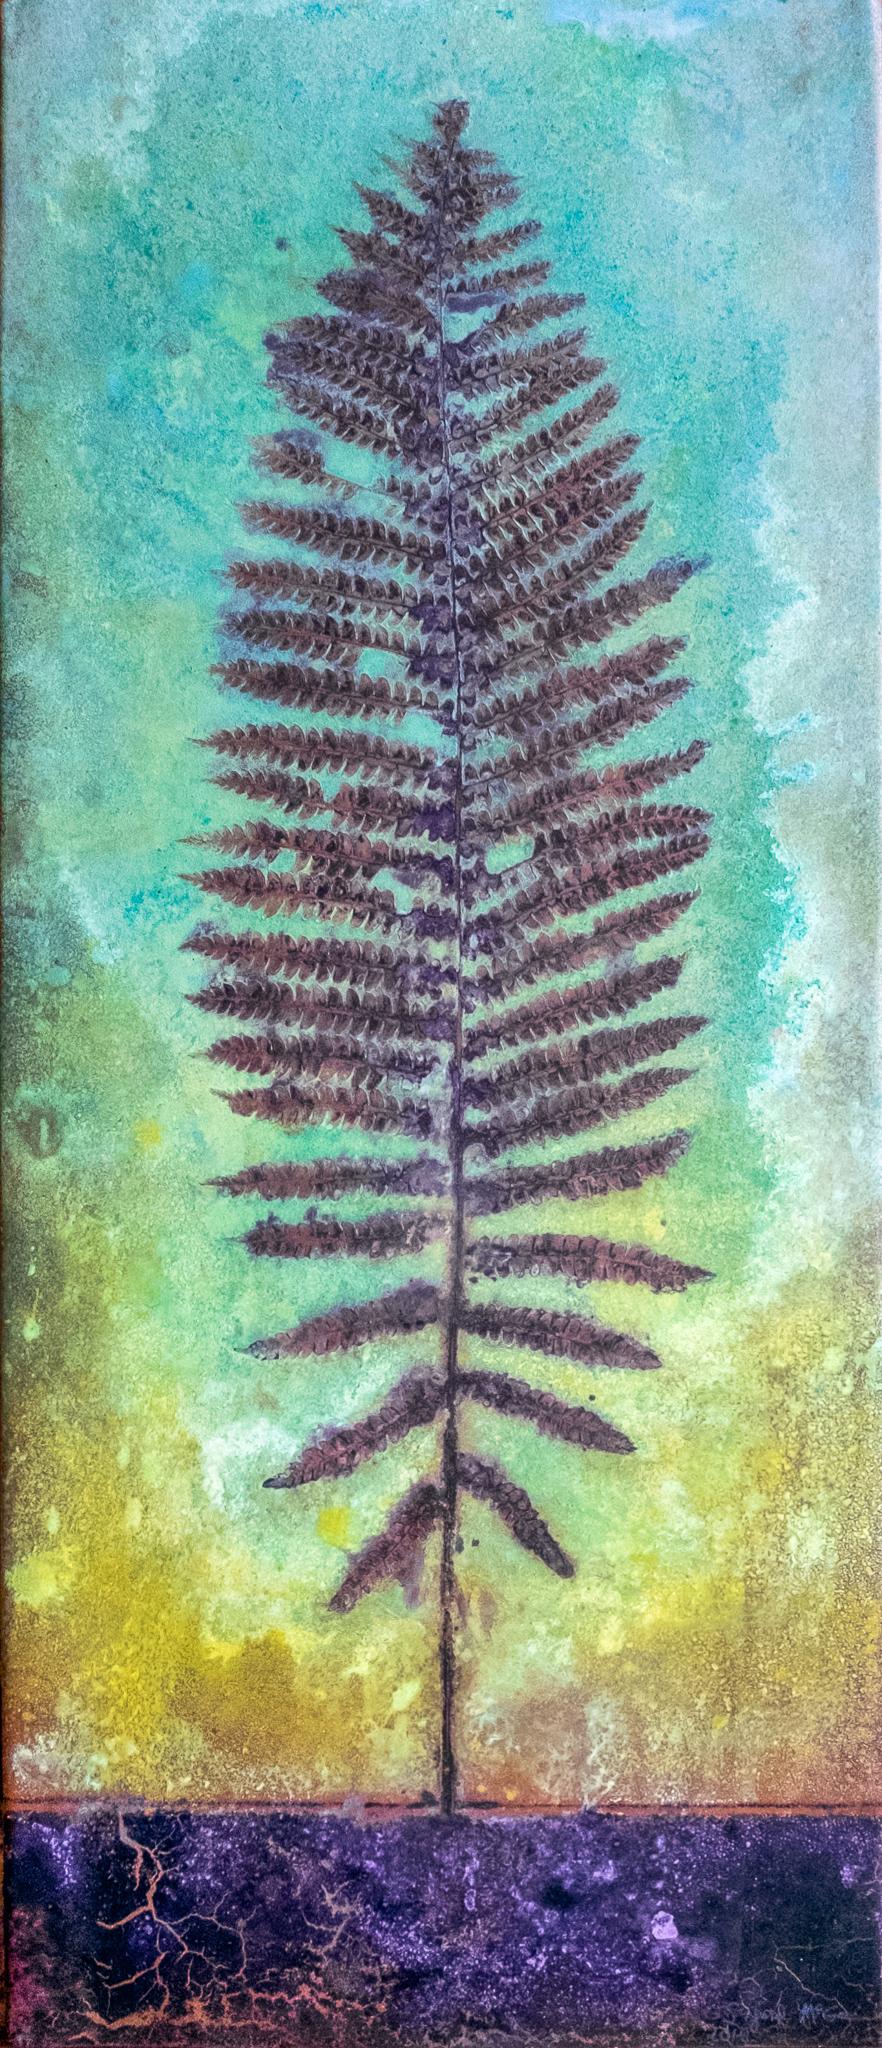 sanford-mcgee-copper-art-tennessee-tall-fern.jpg